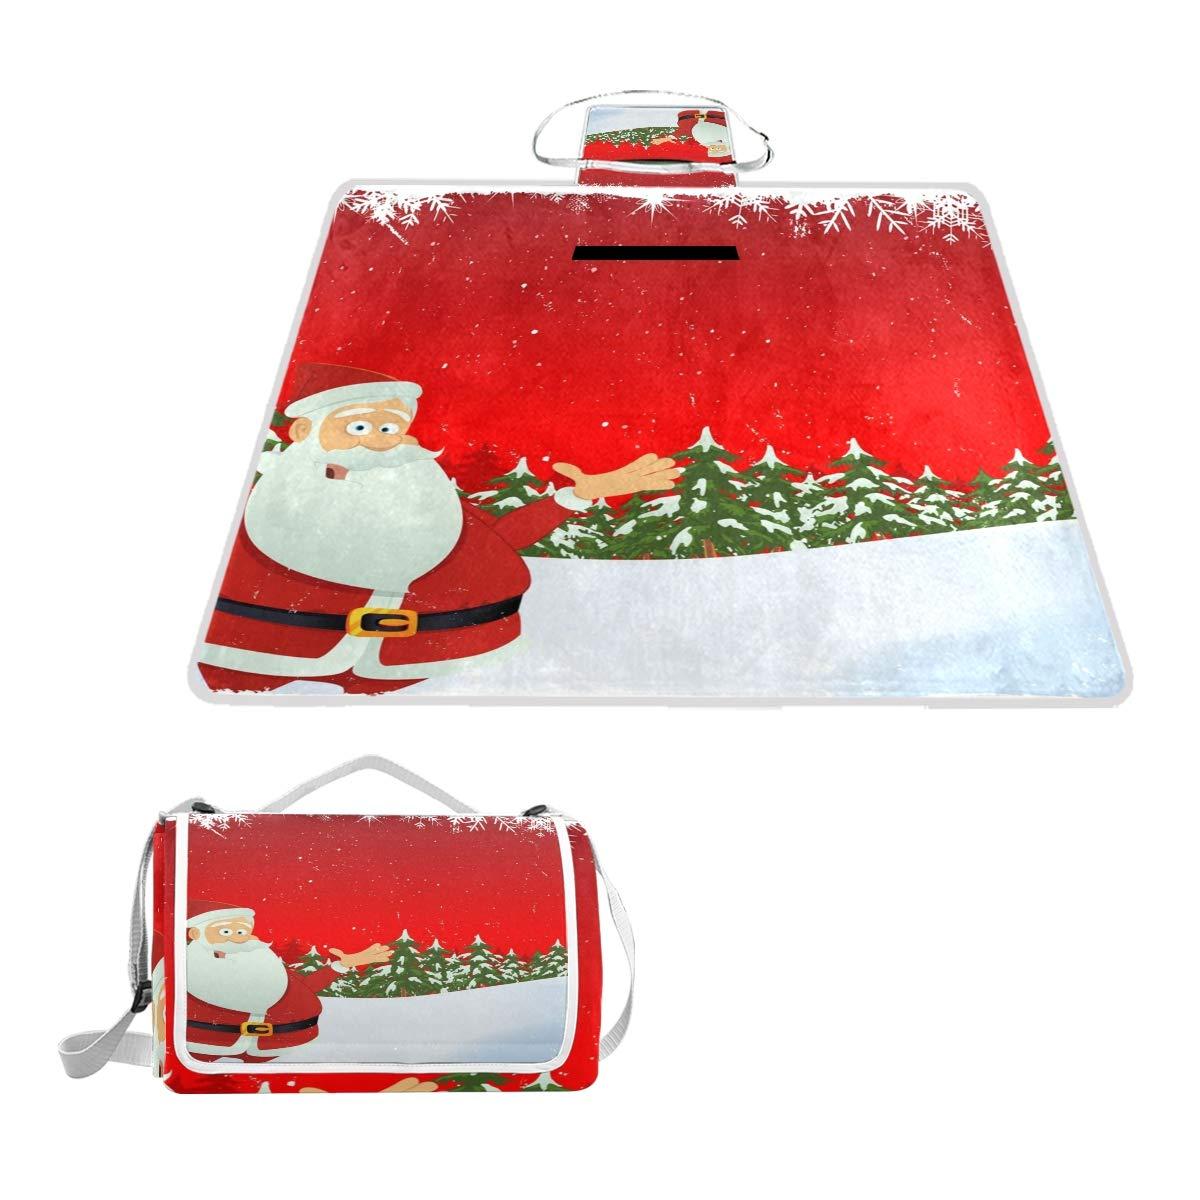 c74fe1fff57b Amazon.com : imobaby Christmas Santa Claus Winter Snow Picnic ...